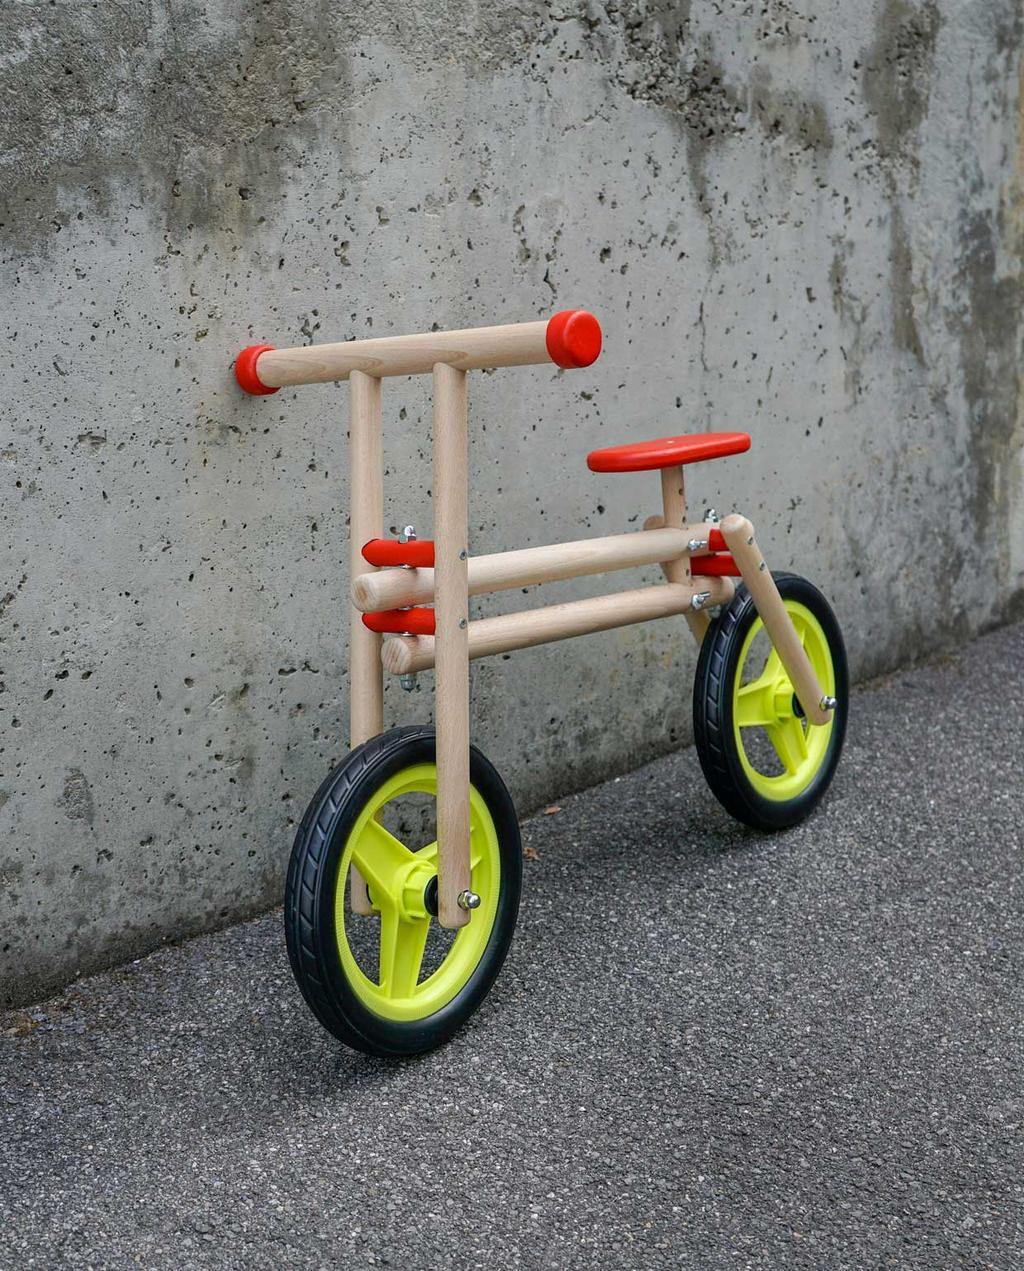 vtwonen | studentdesign | design speelgoed | lea bonvallat | loopfiets